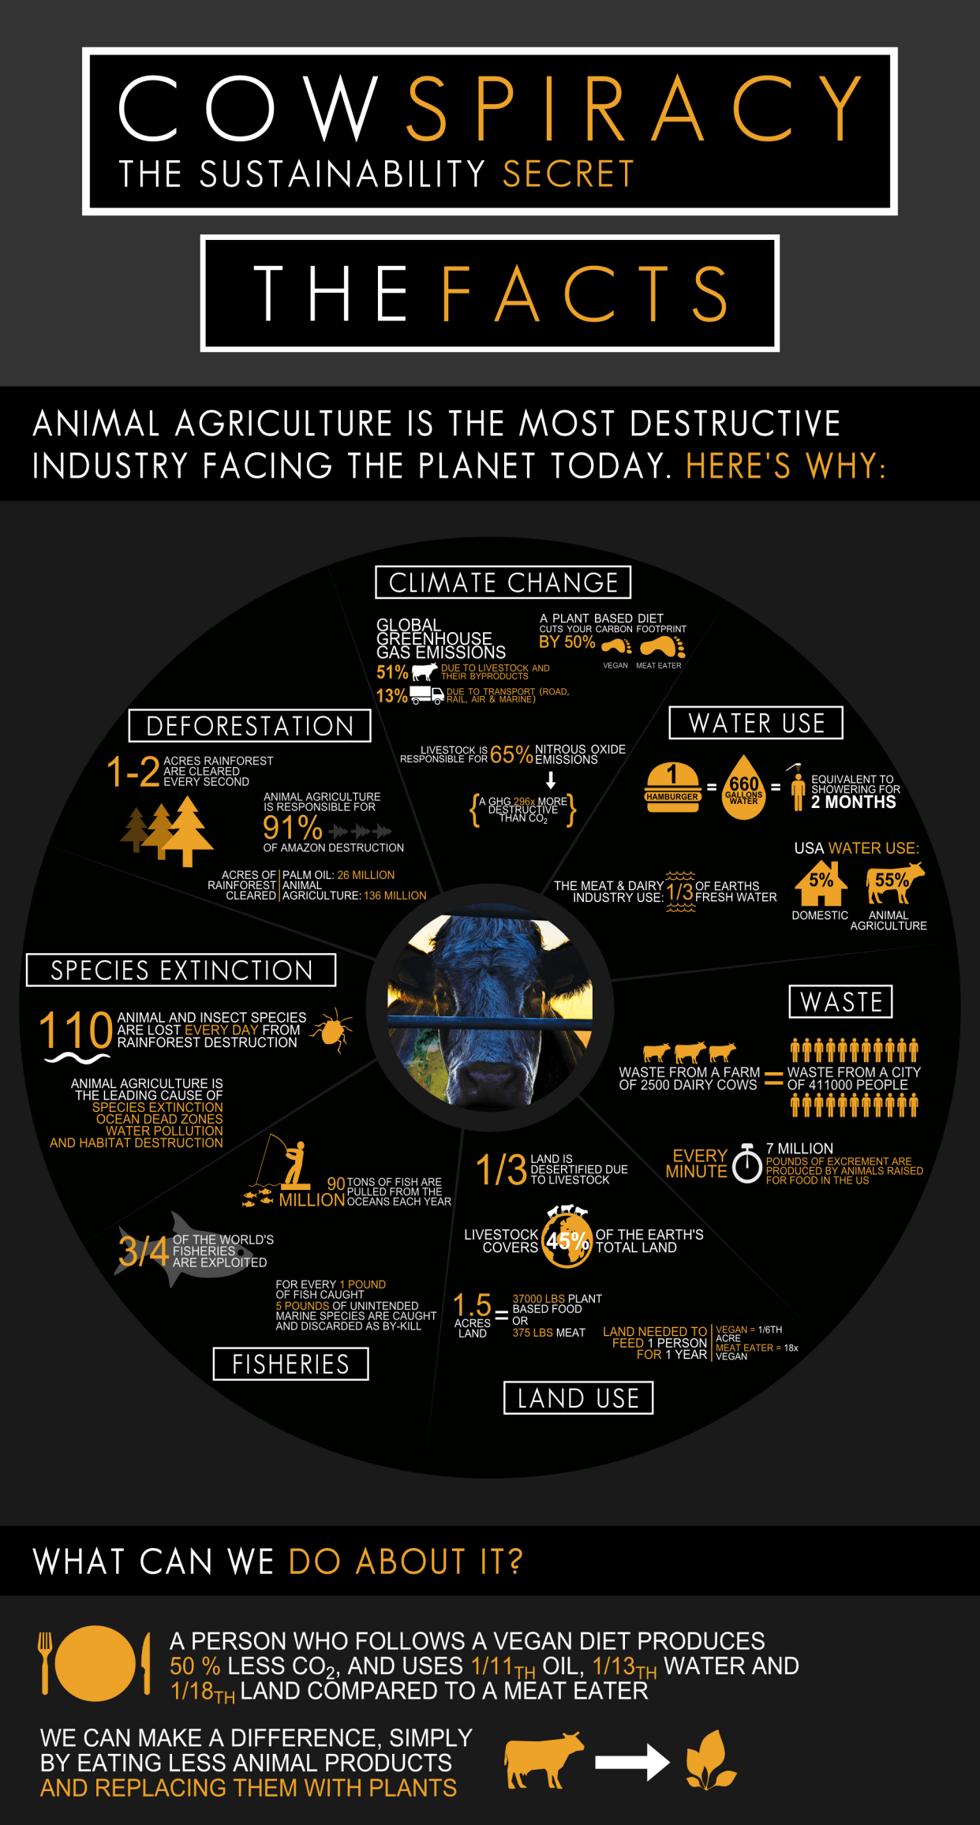 Luke-Jones.-Cowspiracy-Infographic-Imperial-Updated